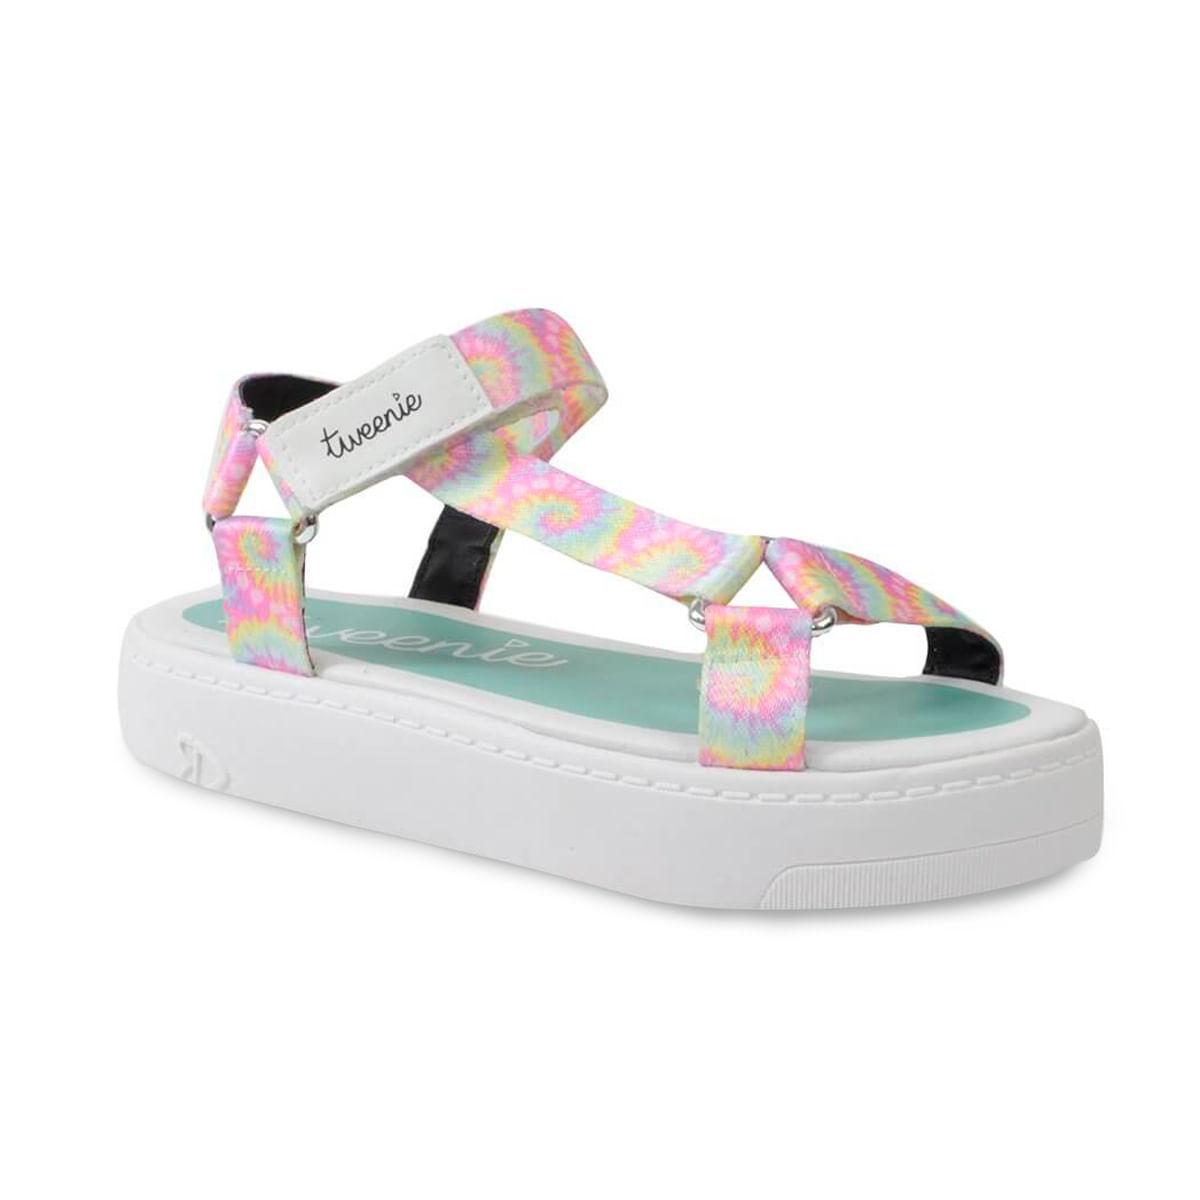 Sandalia-Infantil-Flatform-Tie-Dye--30-ao-37--545.006--VER21-